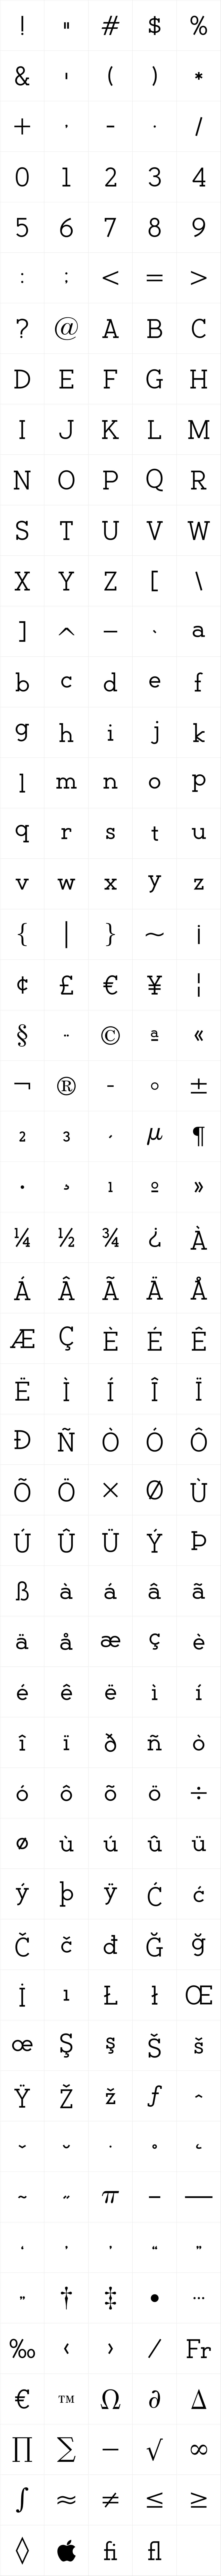 Backtalk Serif BTN